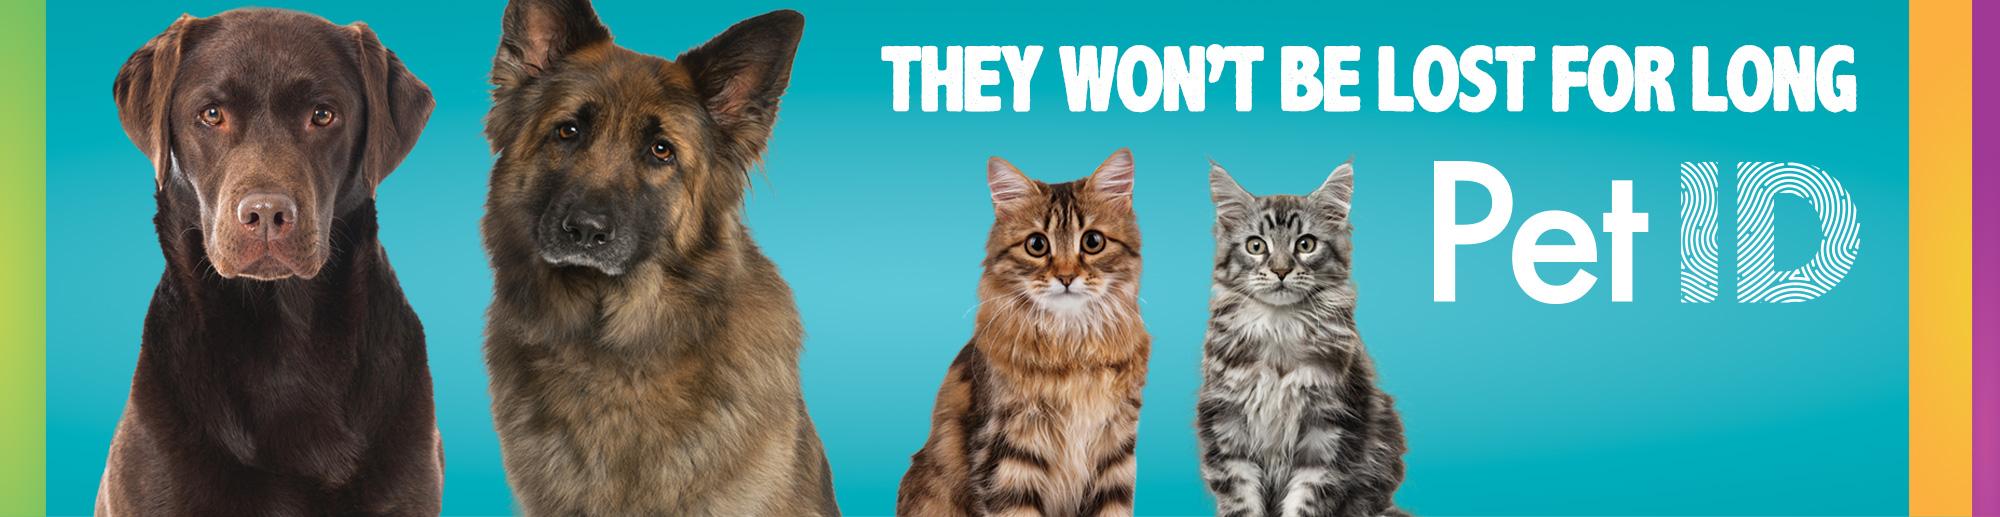 Pet ID Campaign